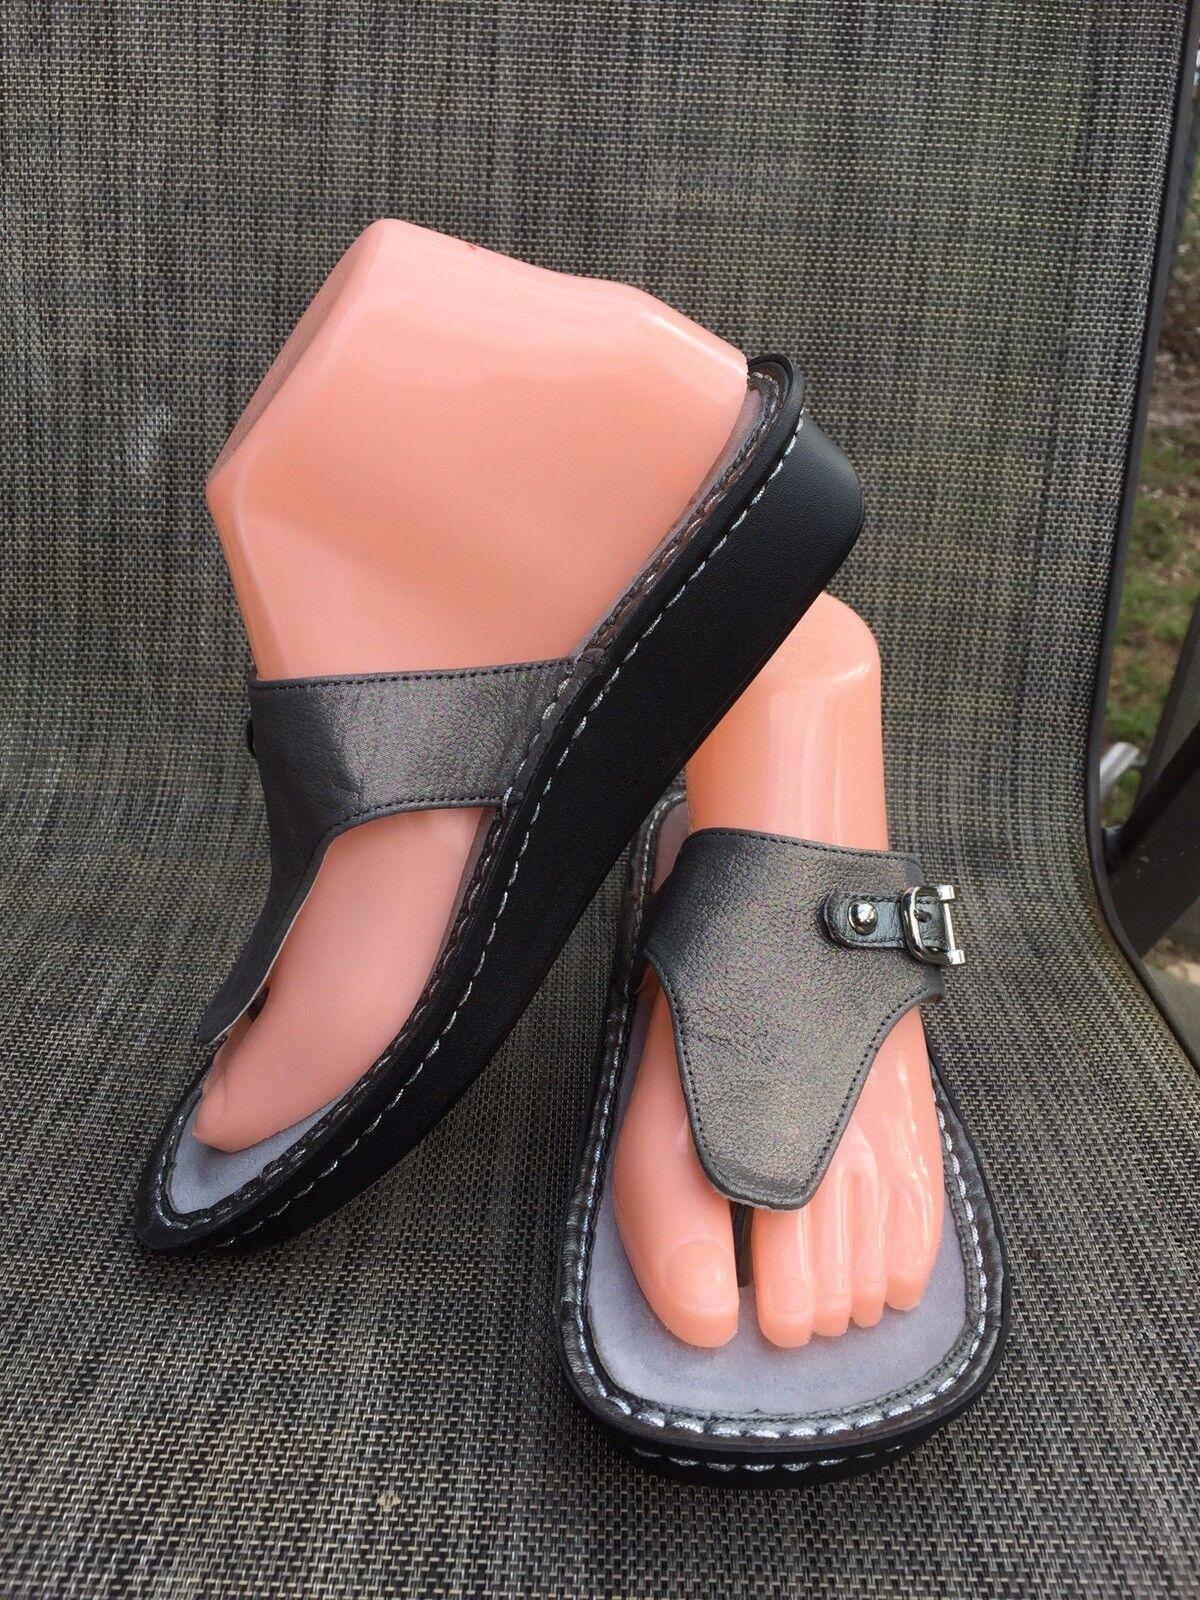 Alegria Vanessa VAN-204 Estaño Estaño Estaño Slip On Tanga Toe Sandalias Flip Flop talla.37 7 US  productos creativos